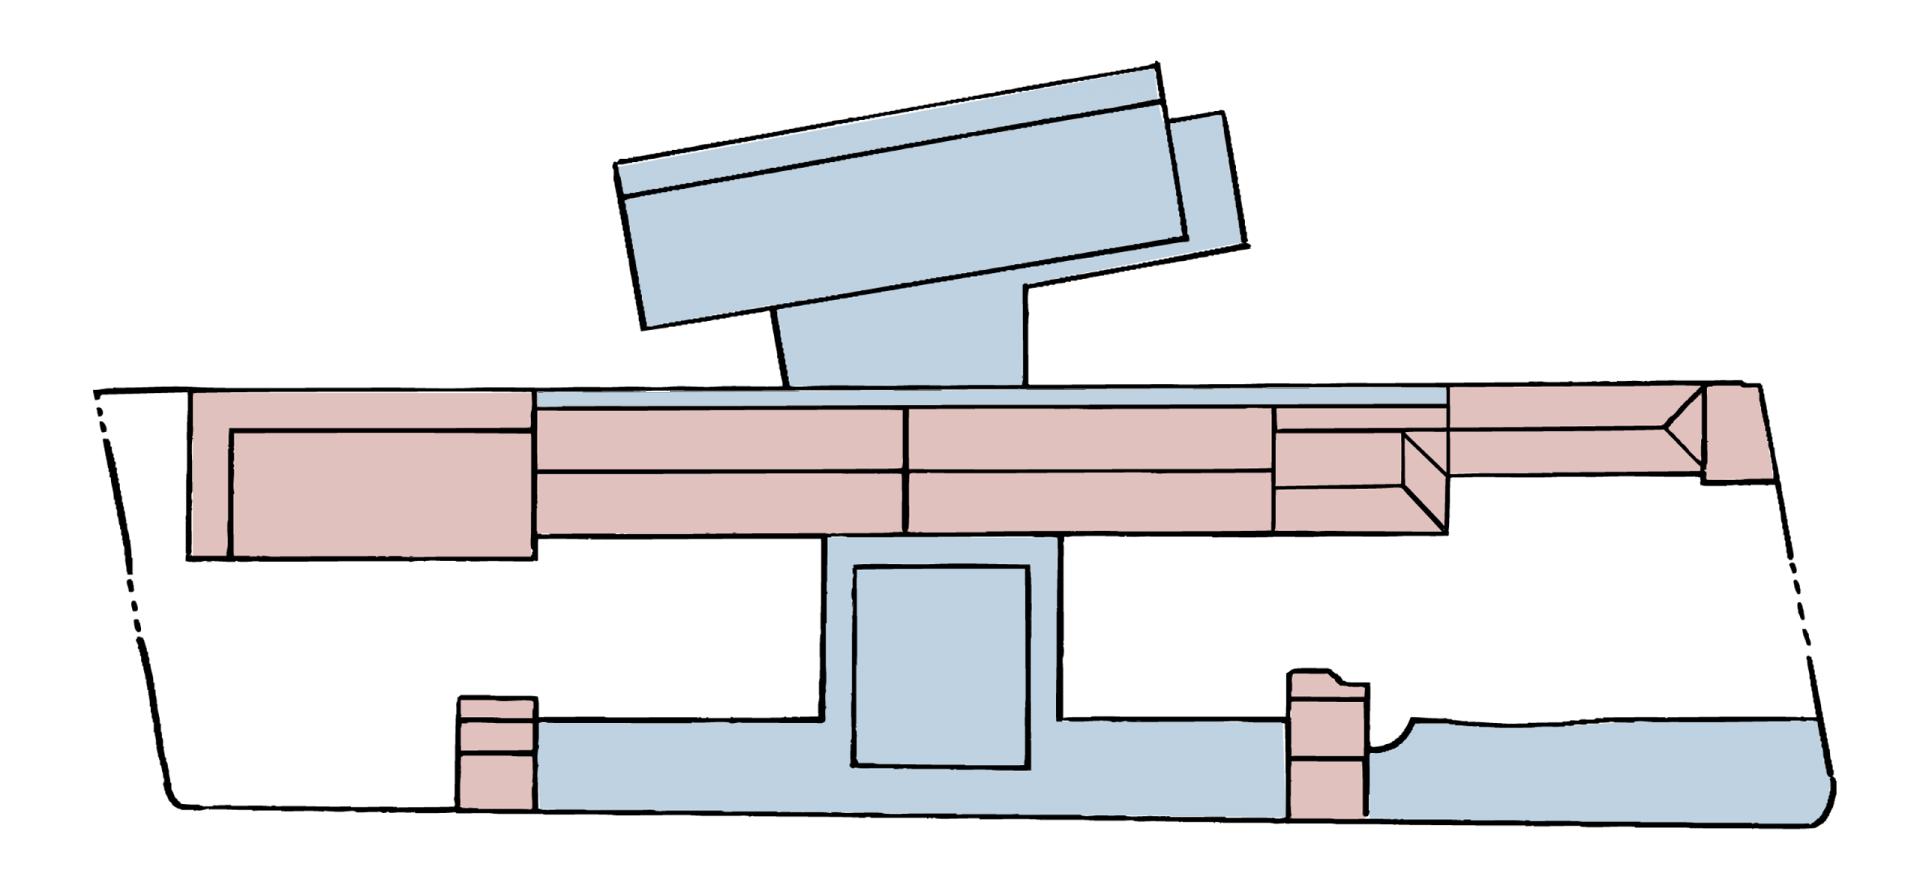 Molen Diagram Old New